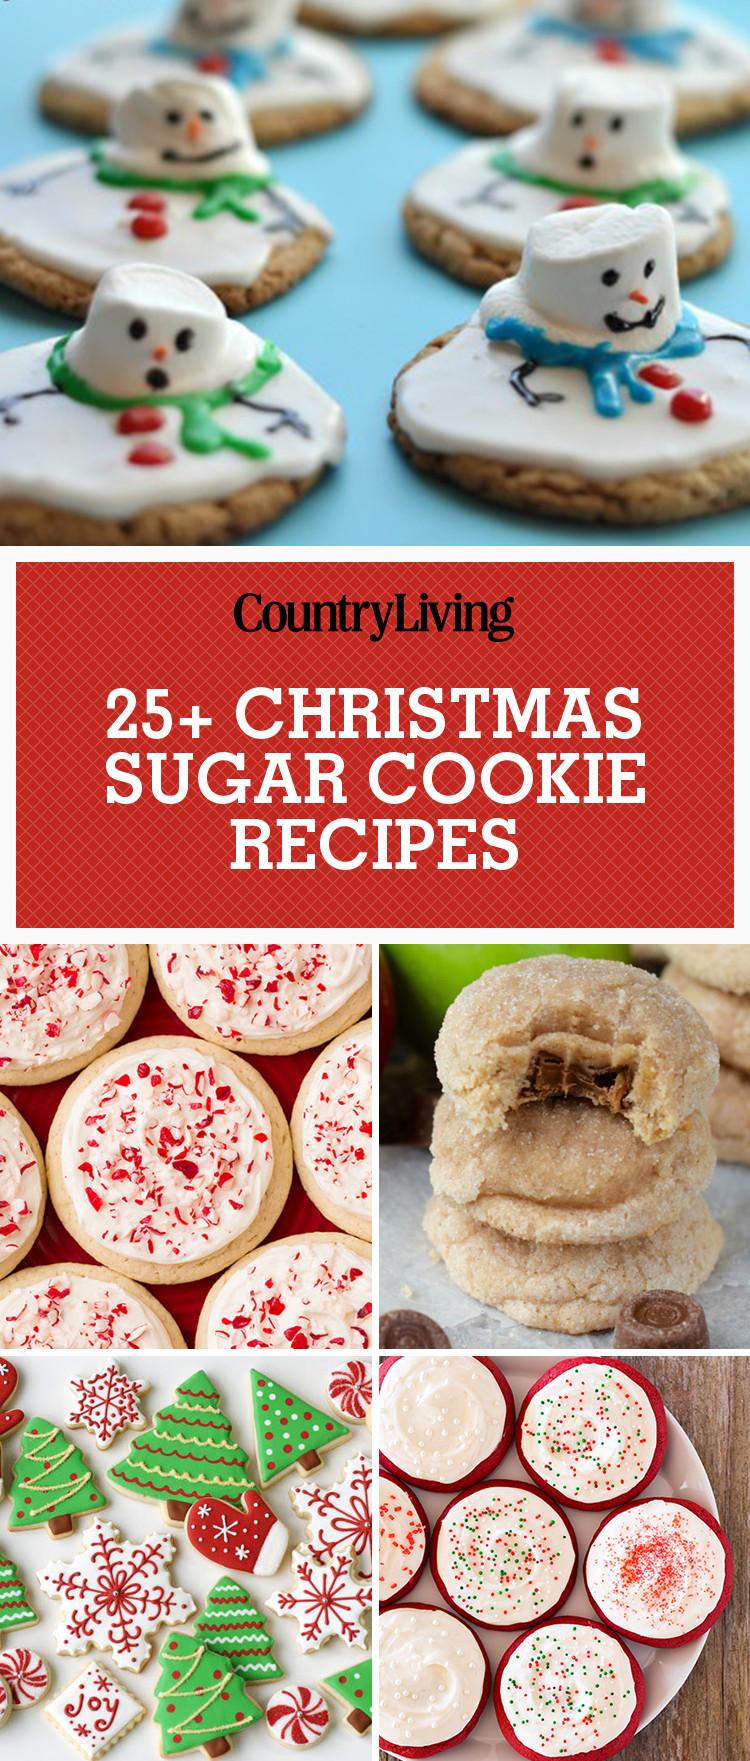 Easy Christmas Sugar Cookies Recipes  25 Easy Christmas Sugar Cookies Recipes & Decorating